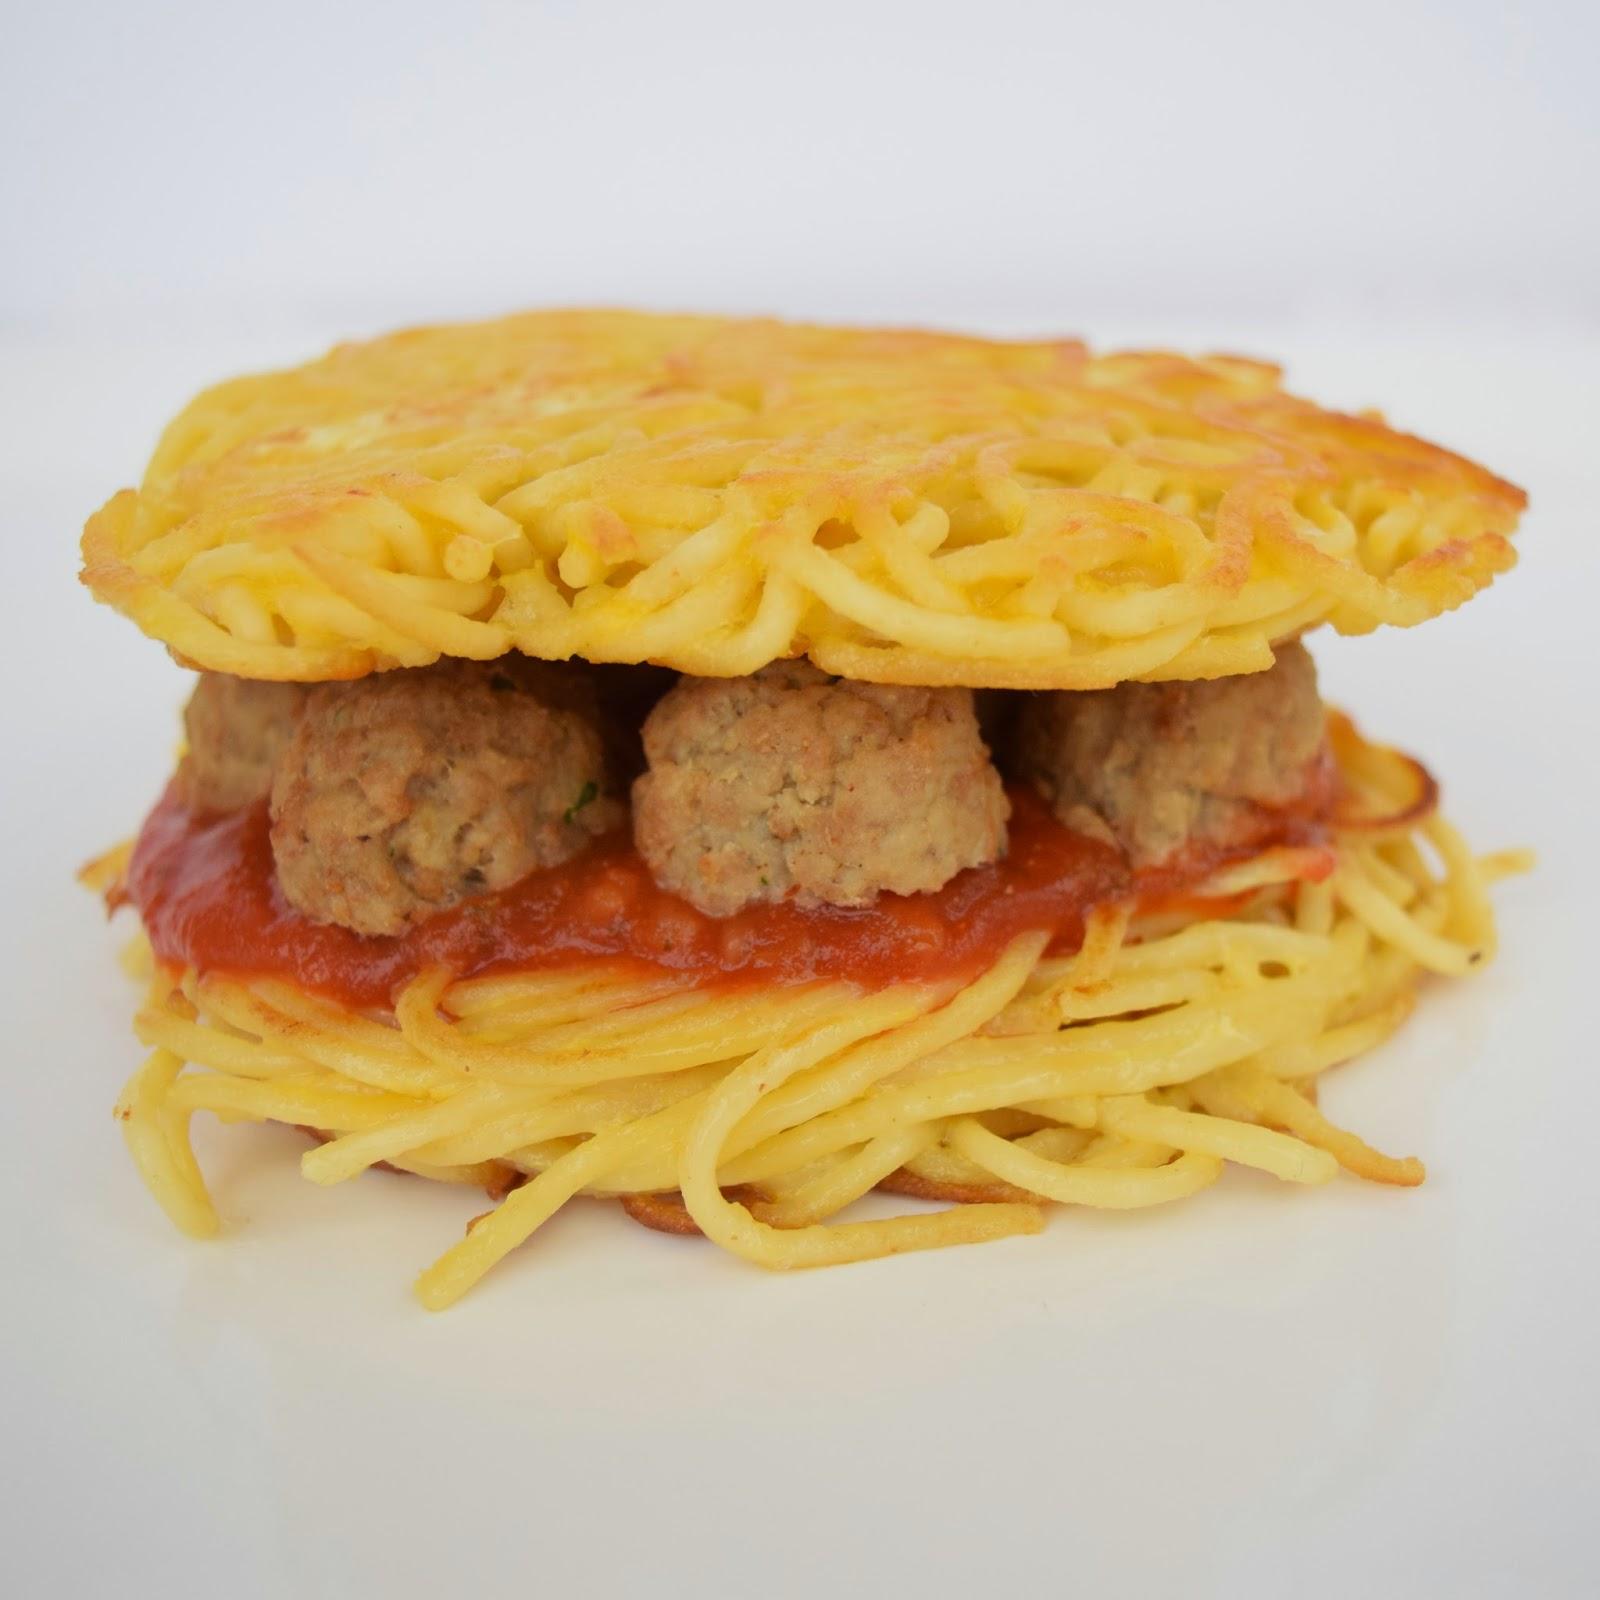 spaghetti and meatball burger recipe